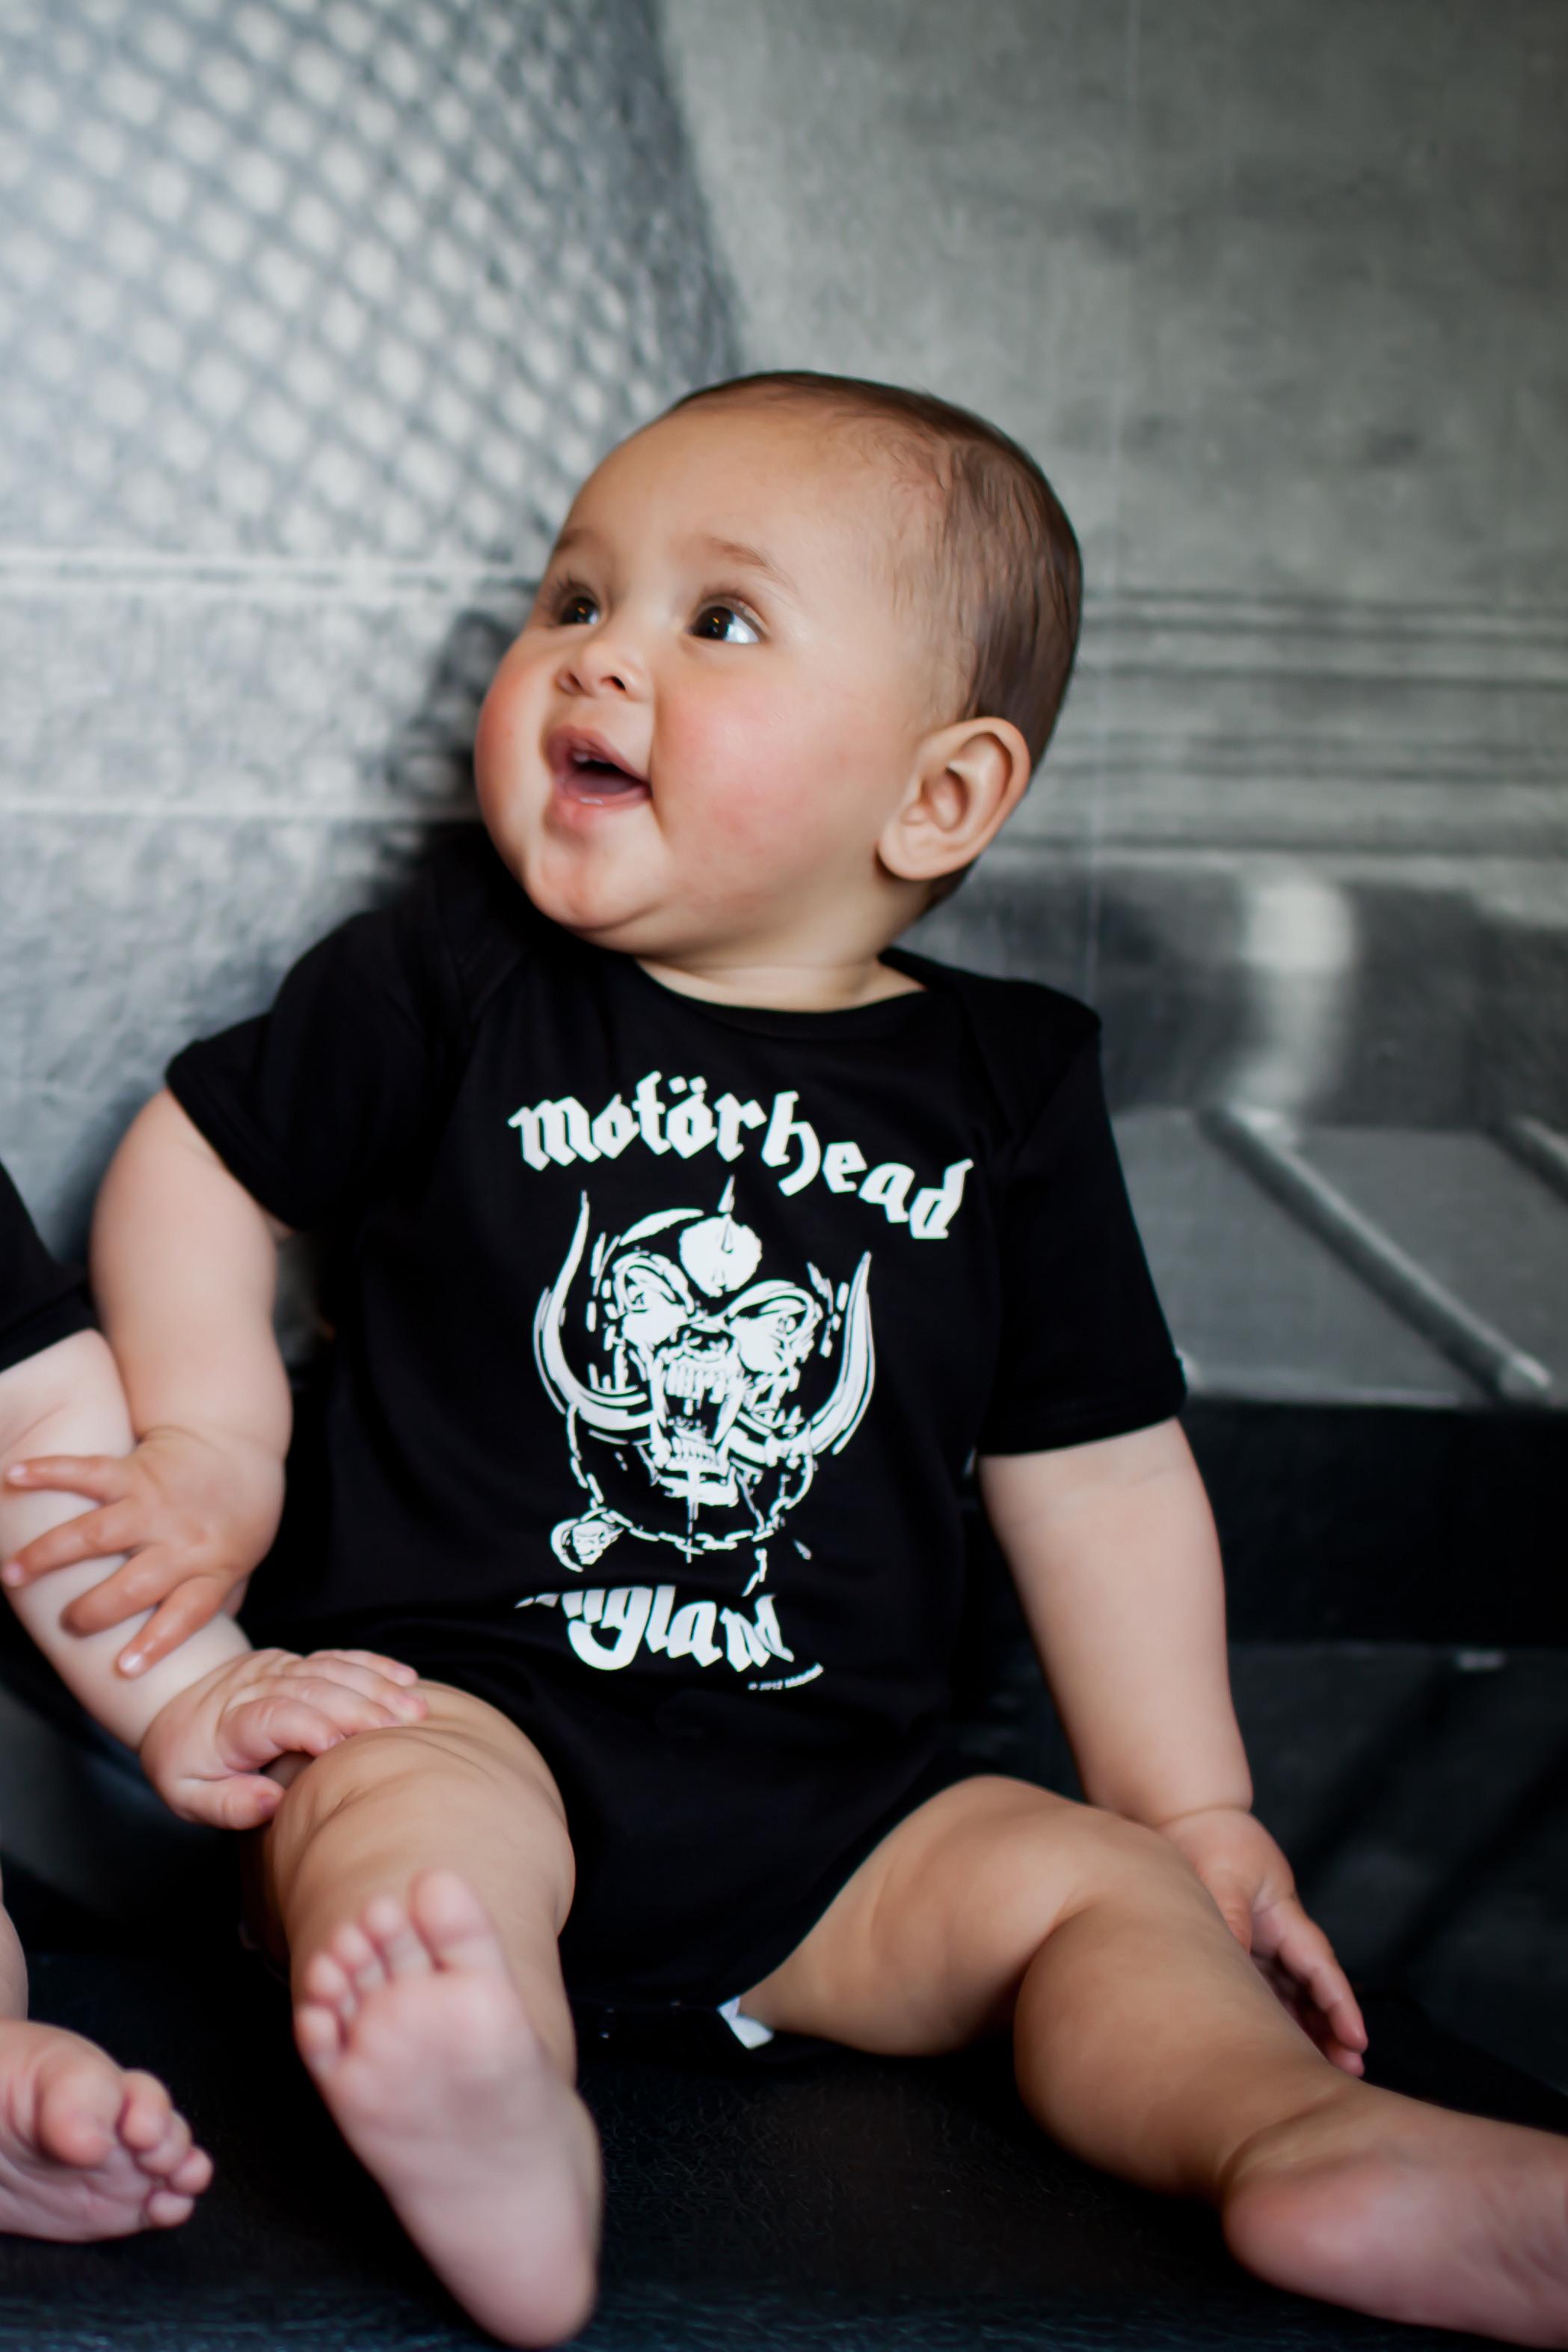 Motorhead baby onesie England